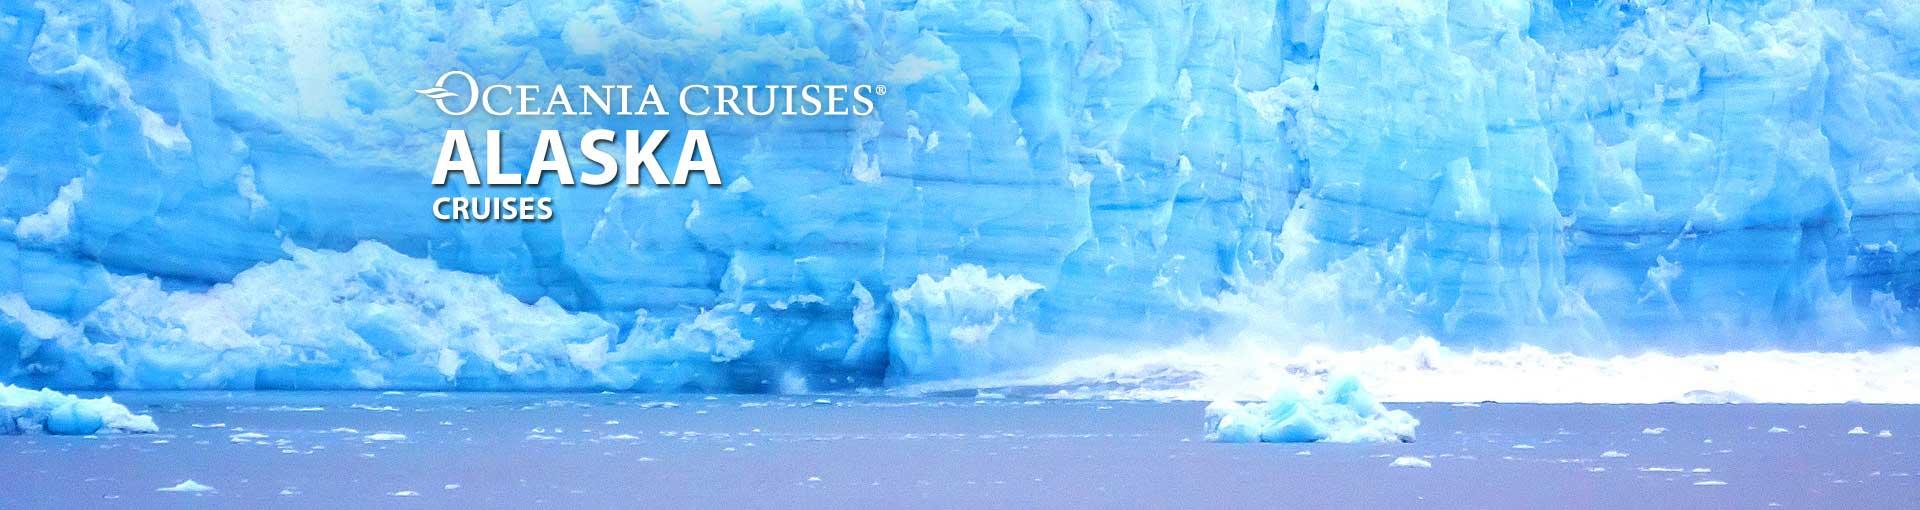 Oceania Cruises Alaska cruises